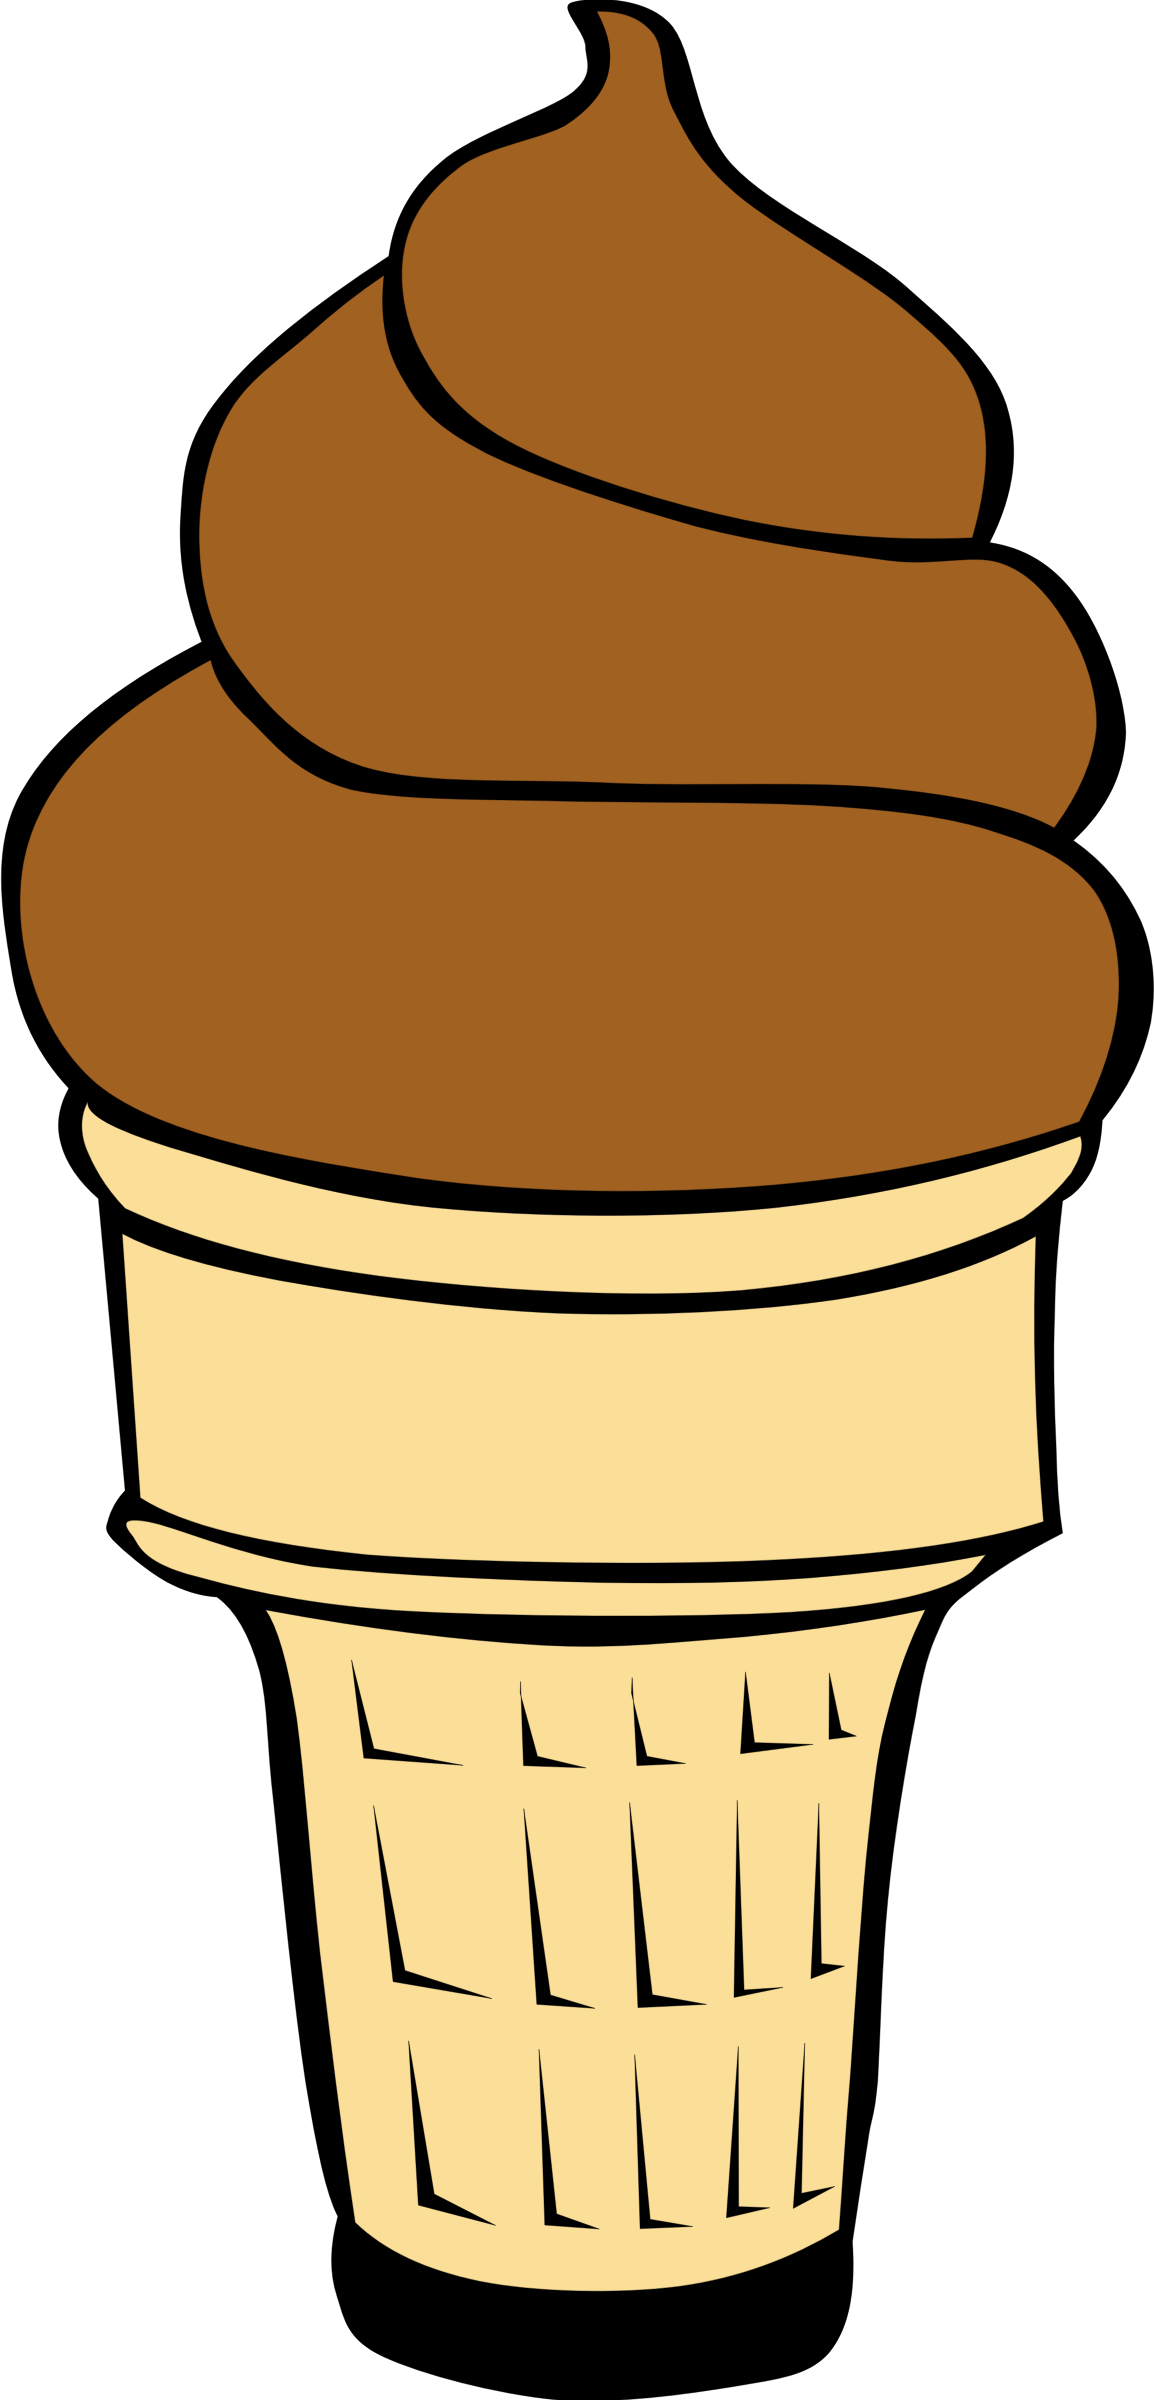 Icecream clipart small. Fast food desserts ice